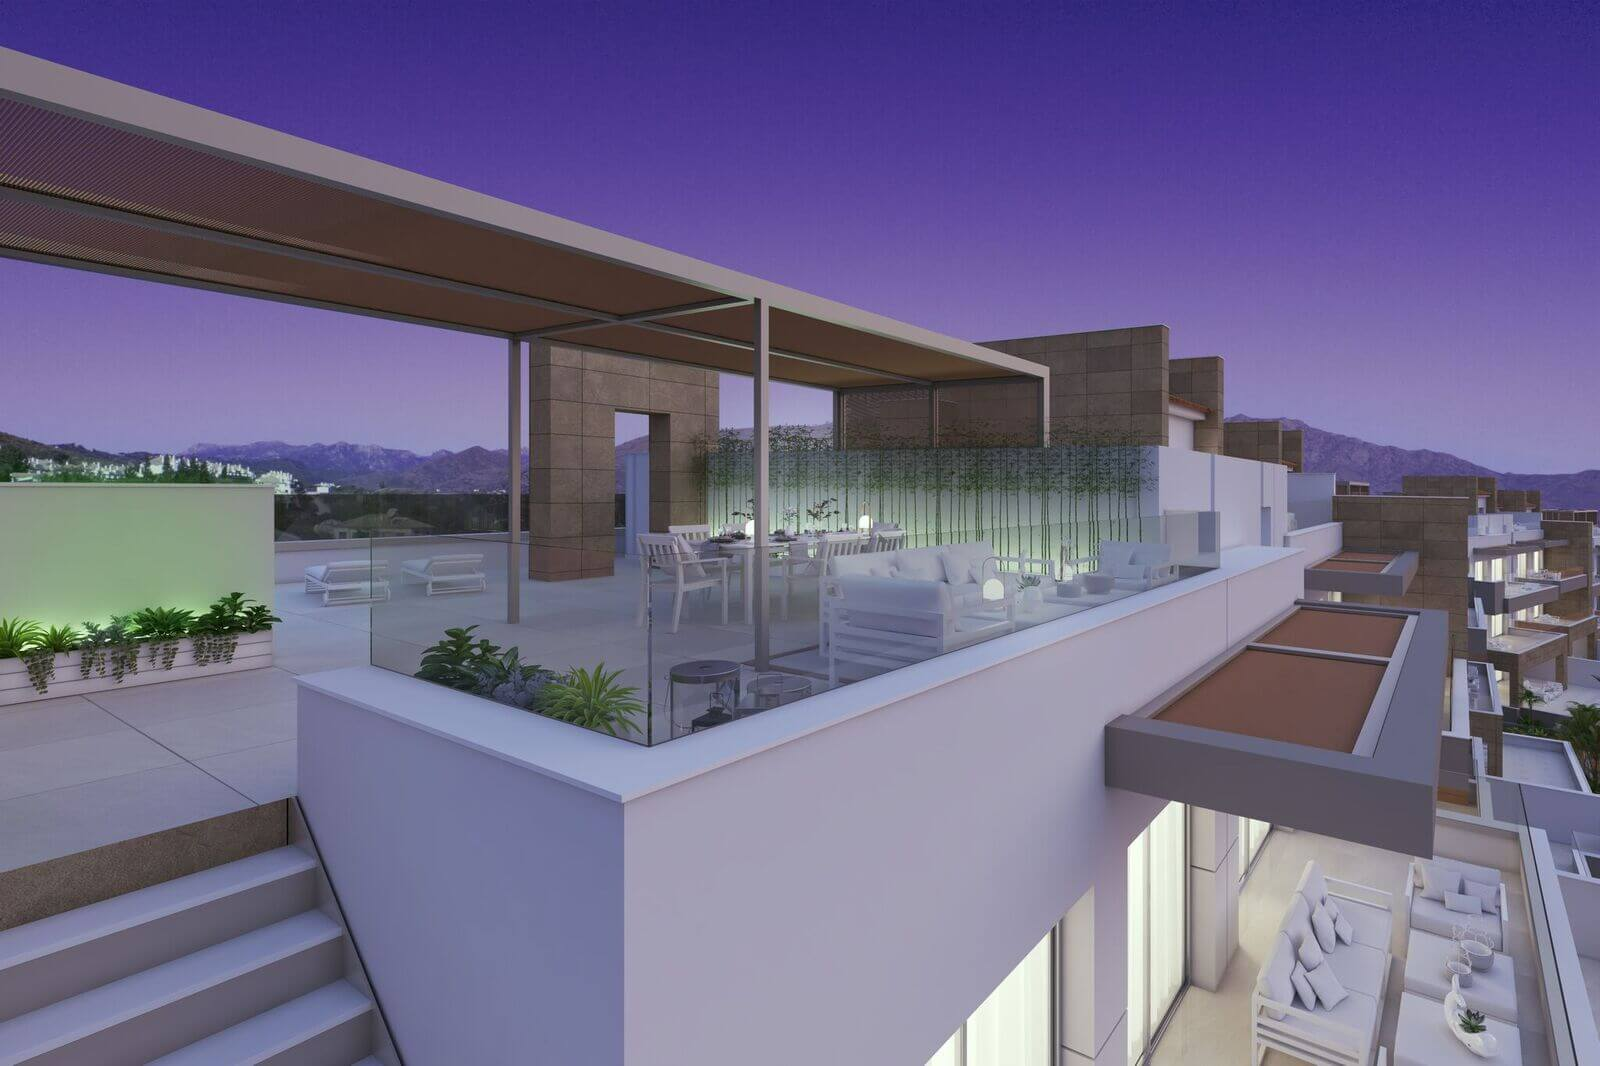 grand view la cala penthouse te koop dakterras